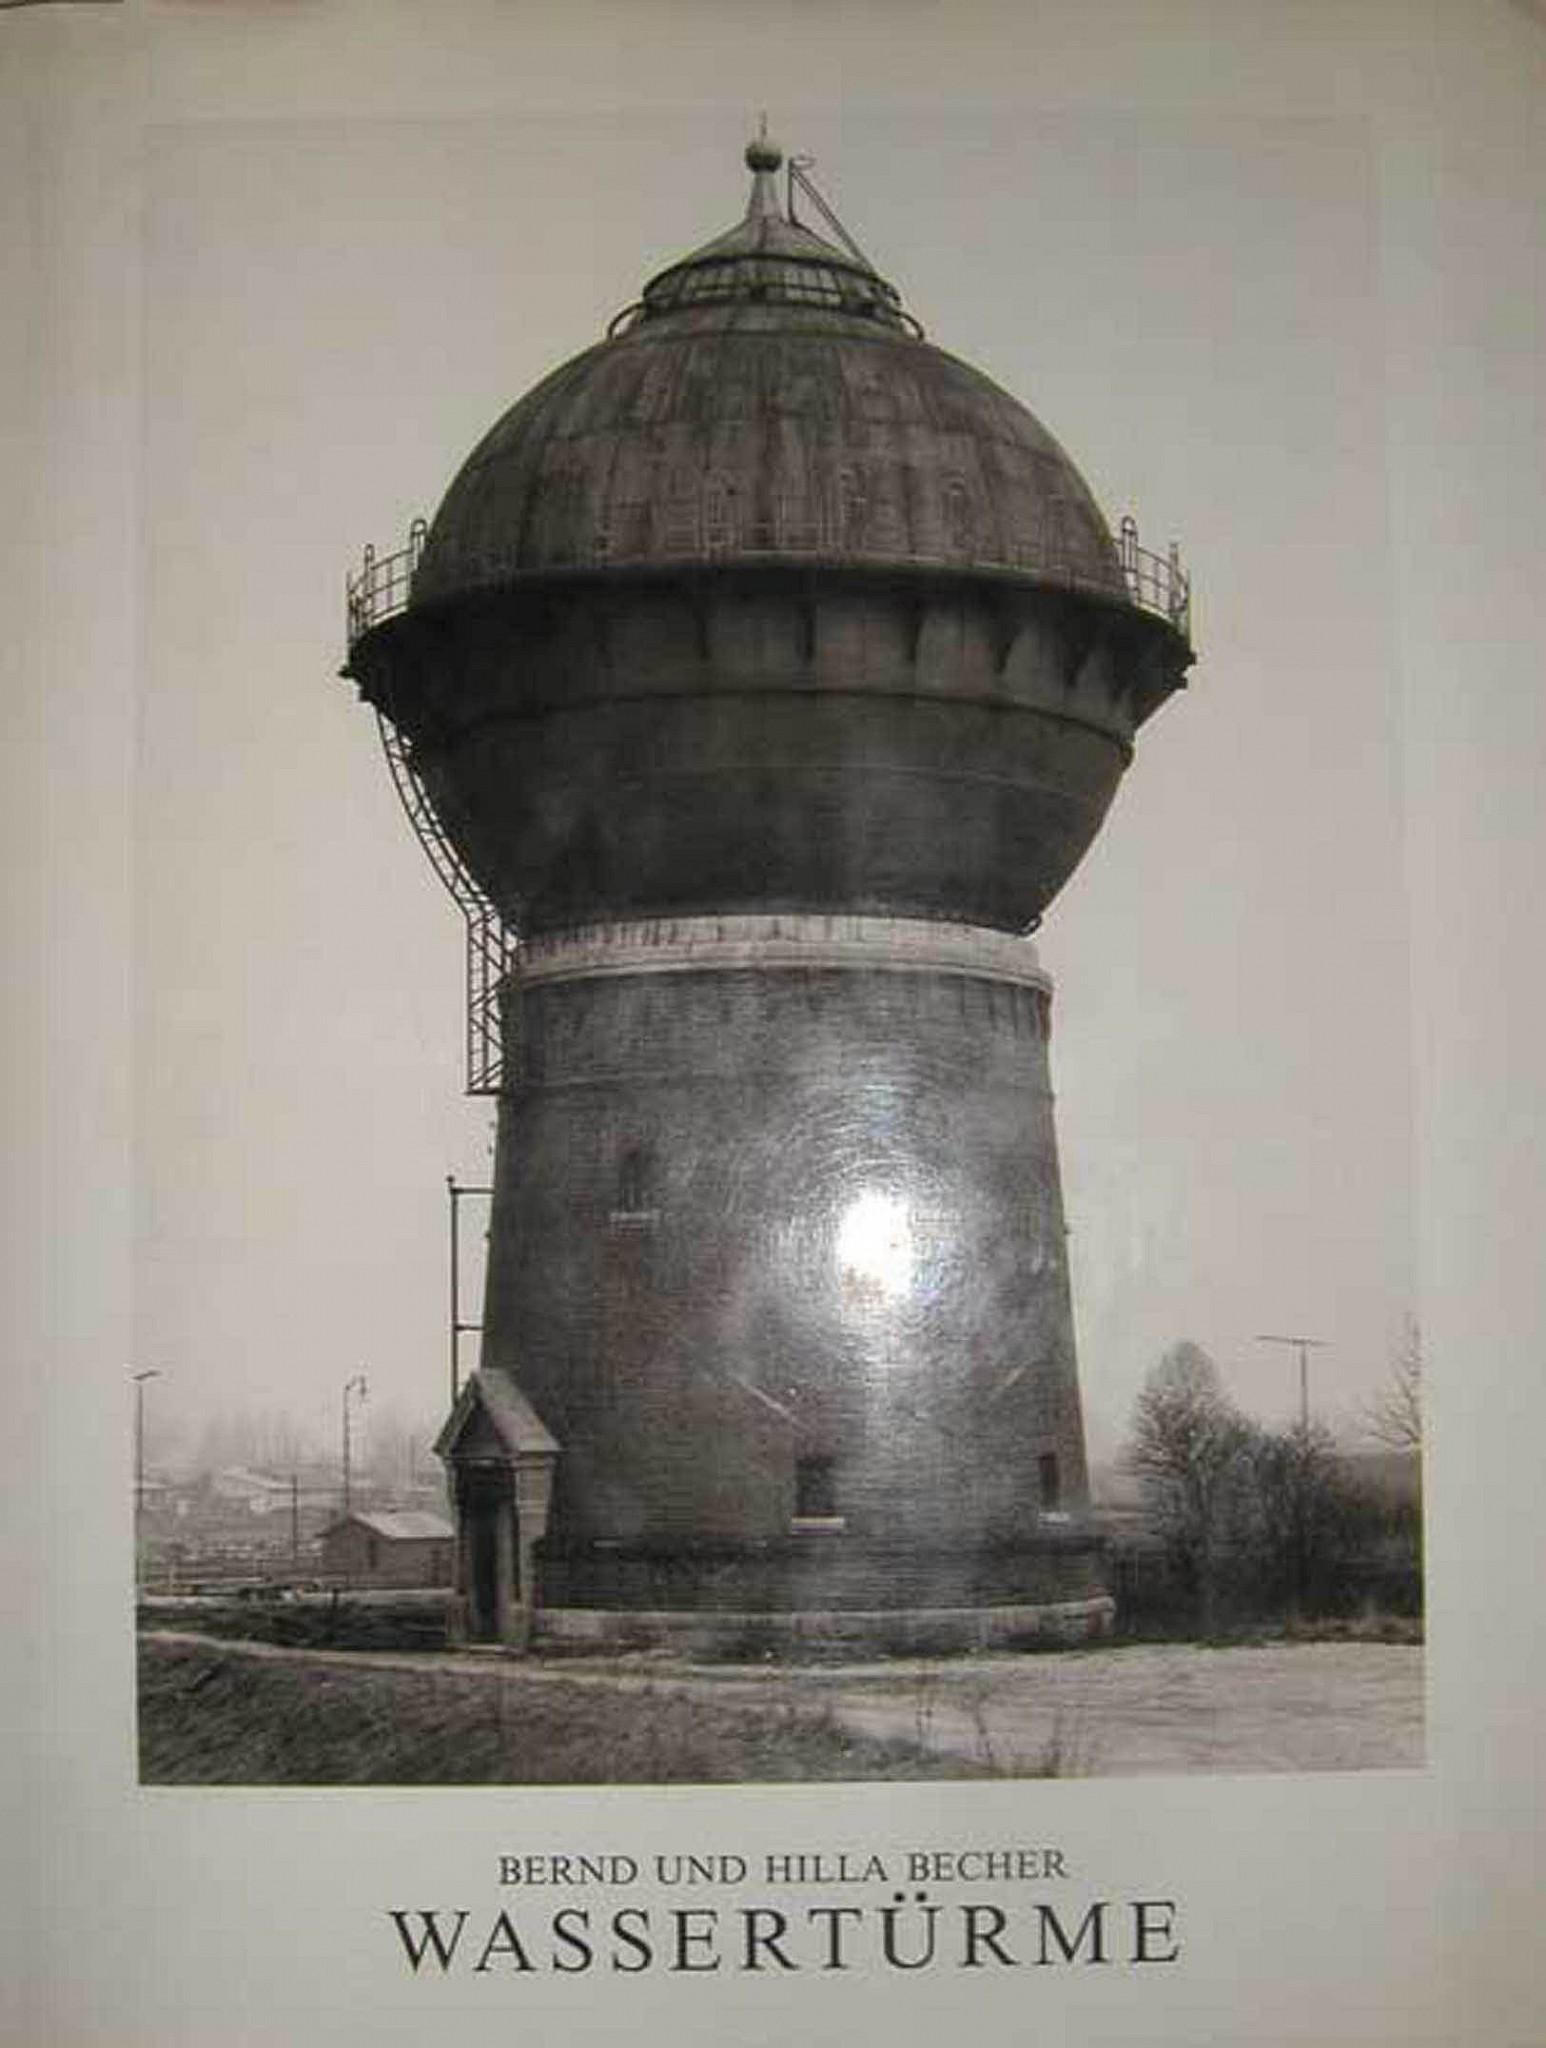 15 Architetti Famosi dieter roth and arnulf rainer | untitled | 1975 | zucker art